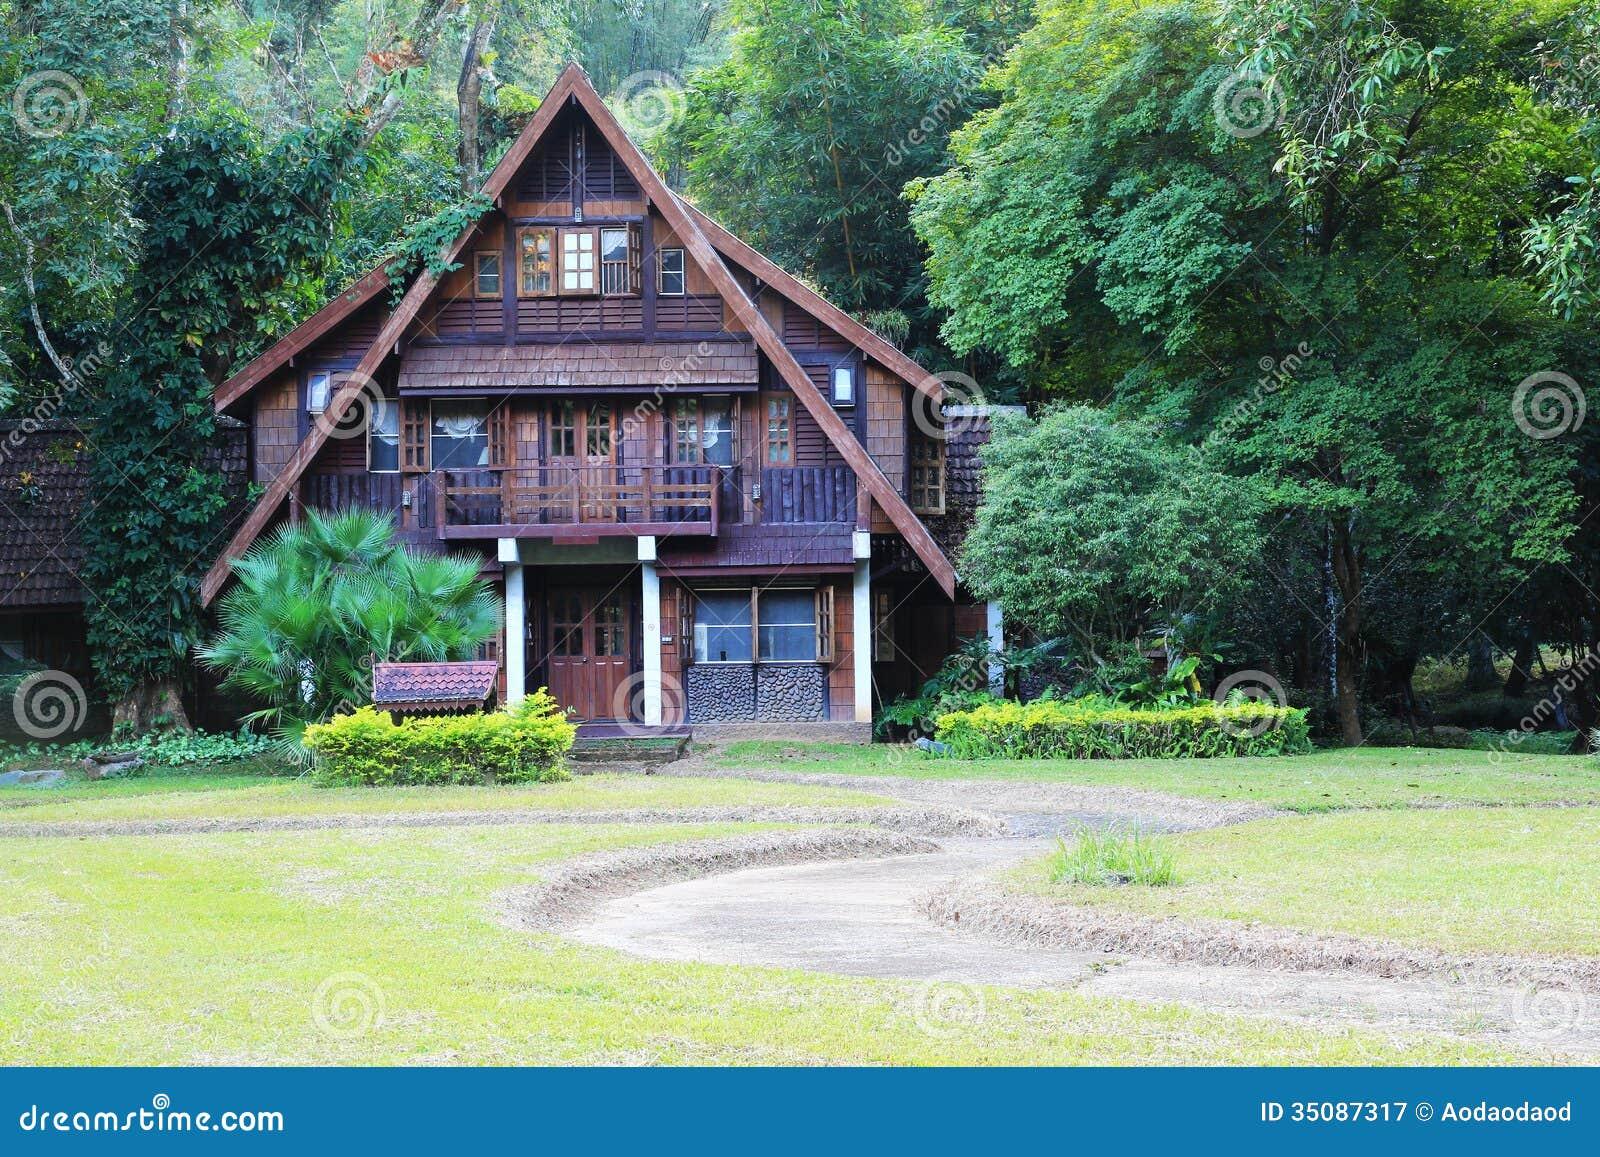 Log Wood House Royalty Free Stock Photography Image